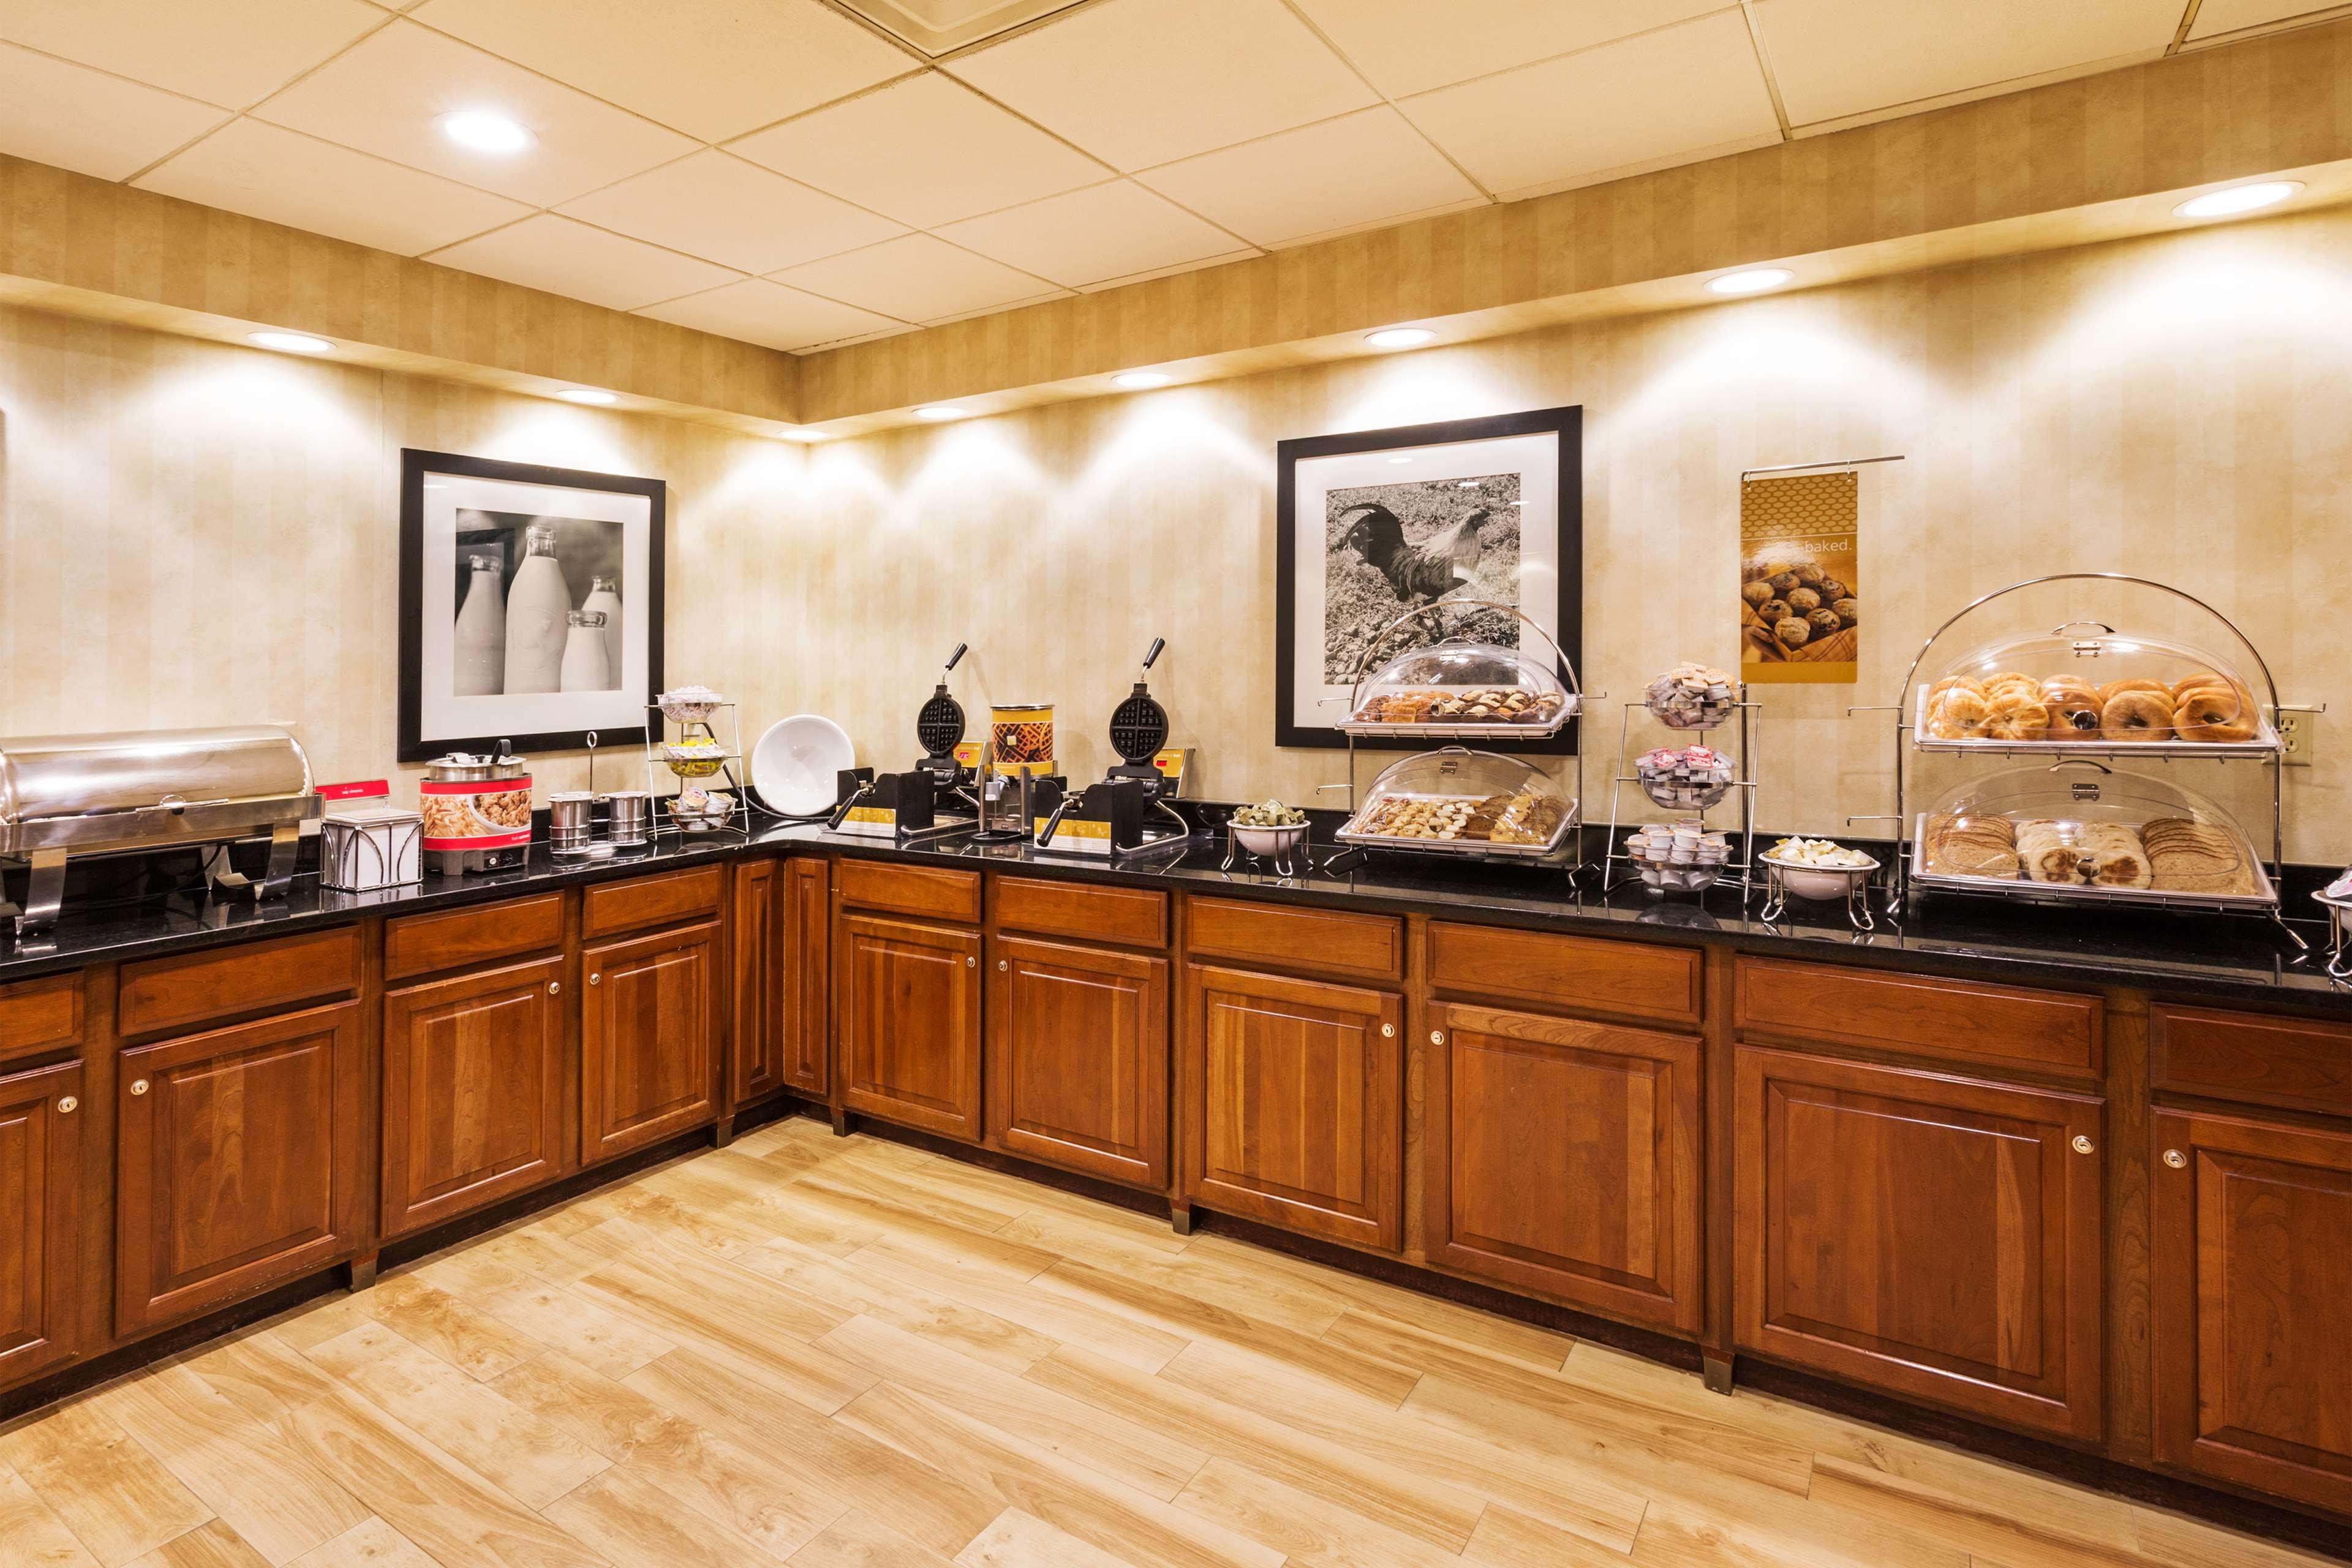 Hampton Inn & Suites Greenville/Spartanburg I-85 image 15